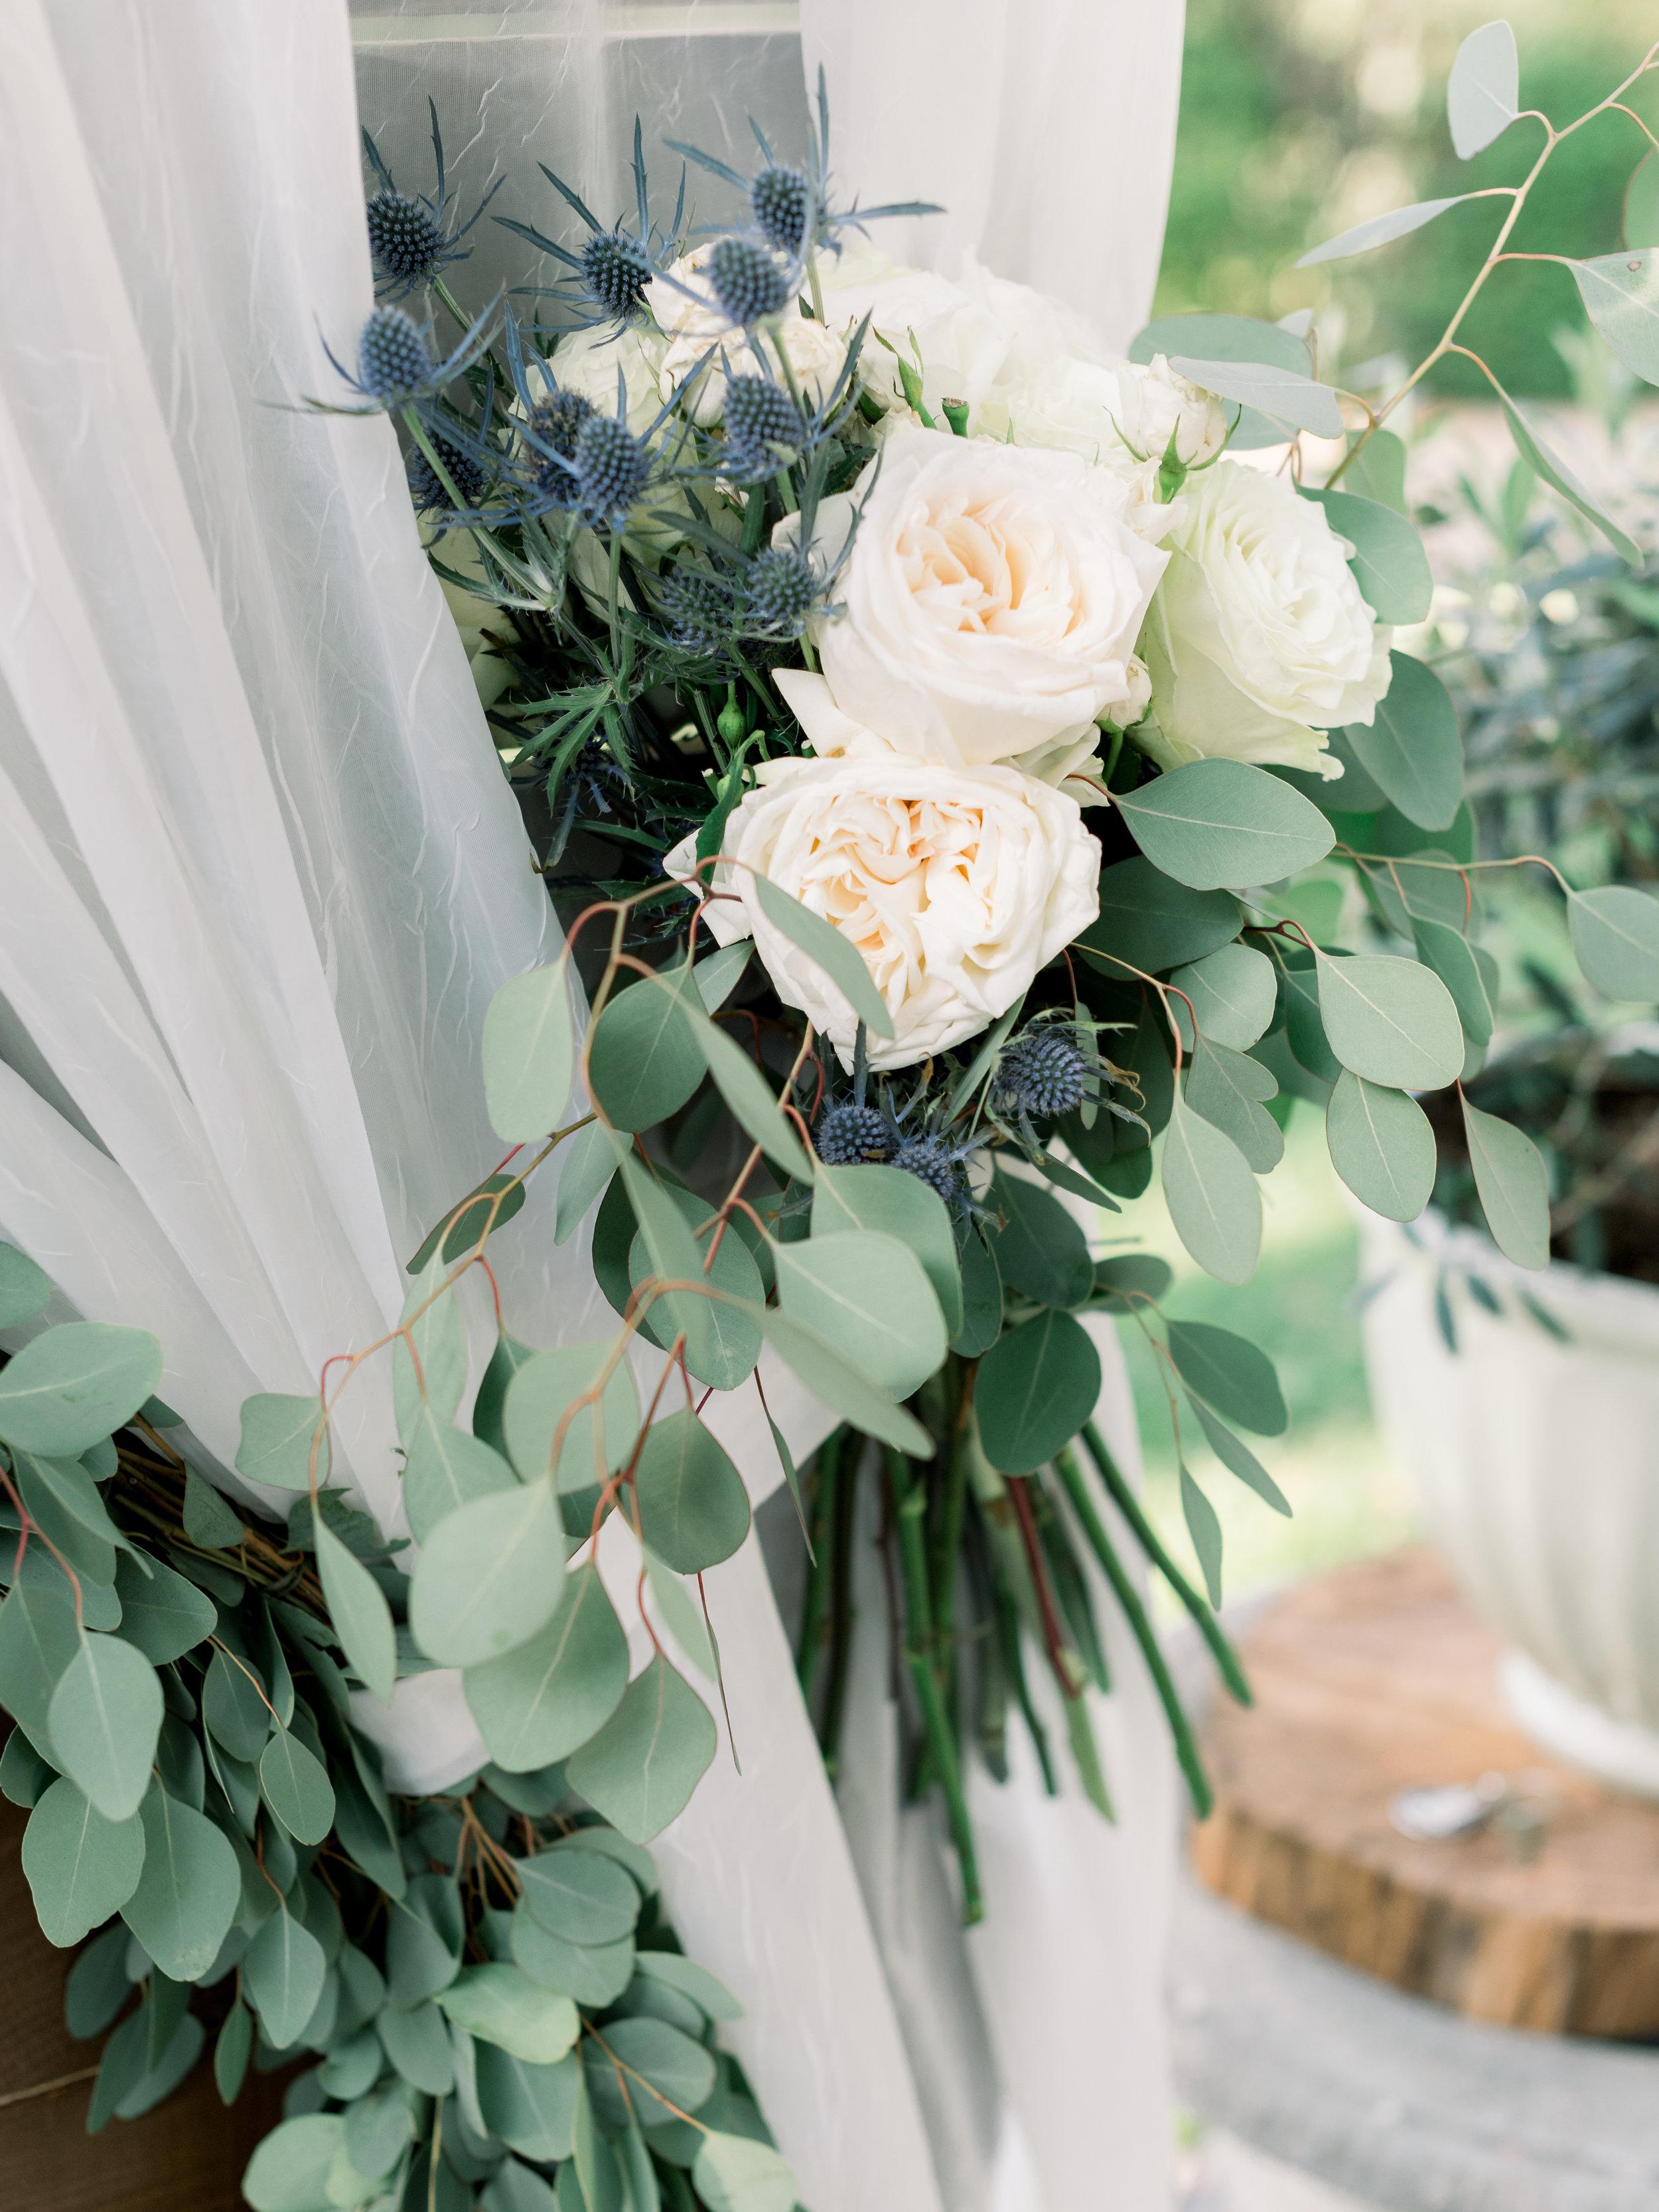 cream-rose-and-blue-thistle-garland-wrapped-around-wedding-altar.jpg